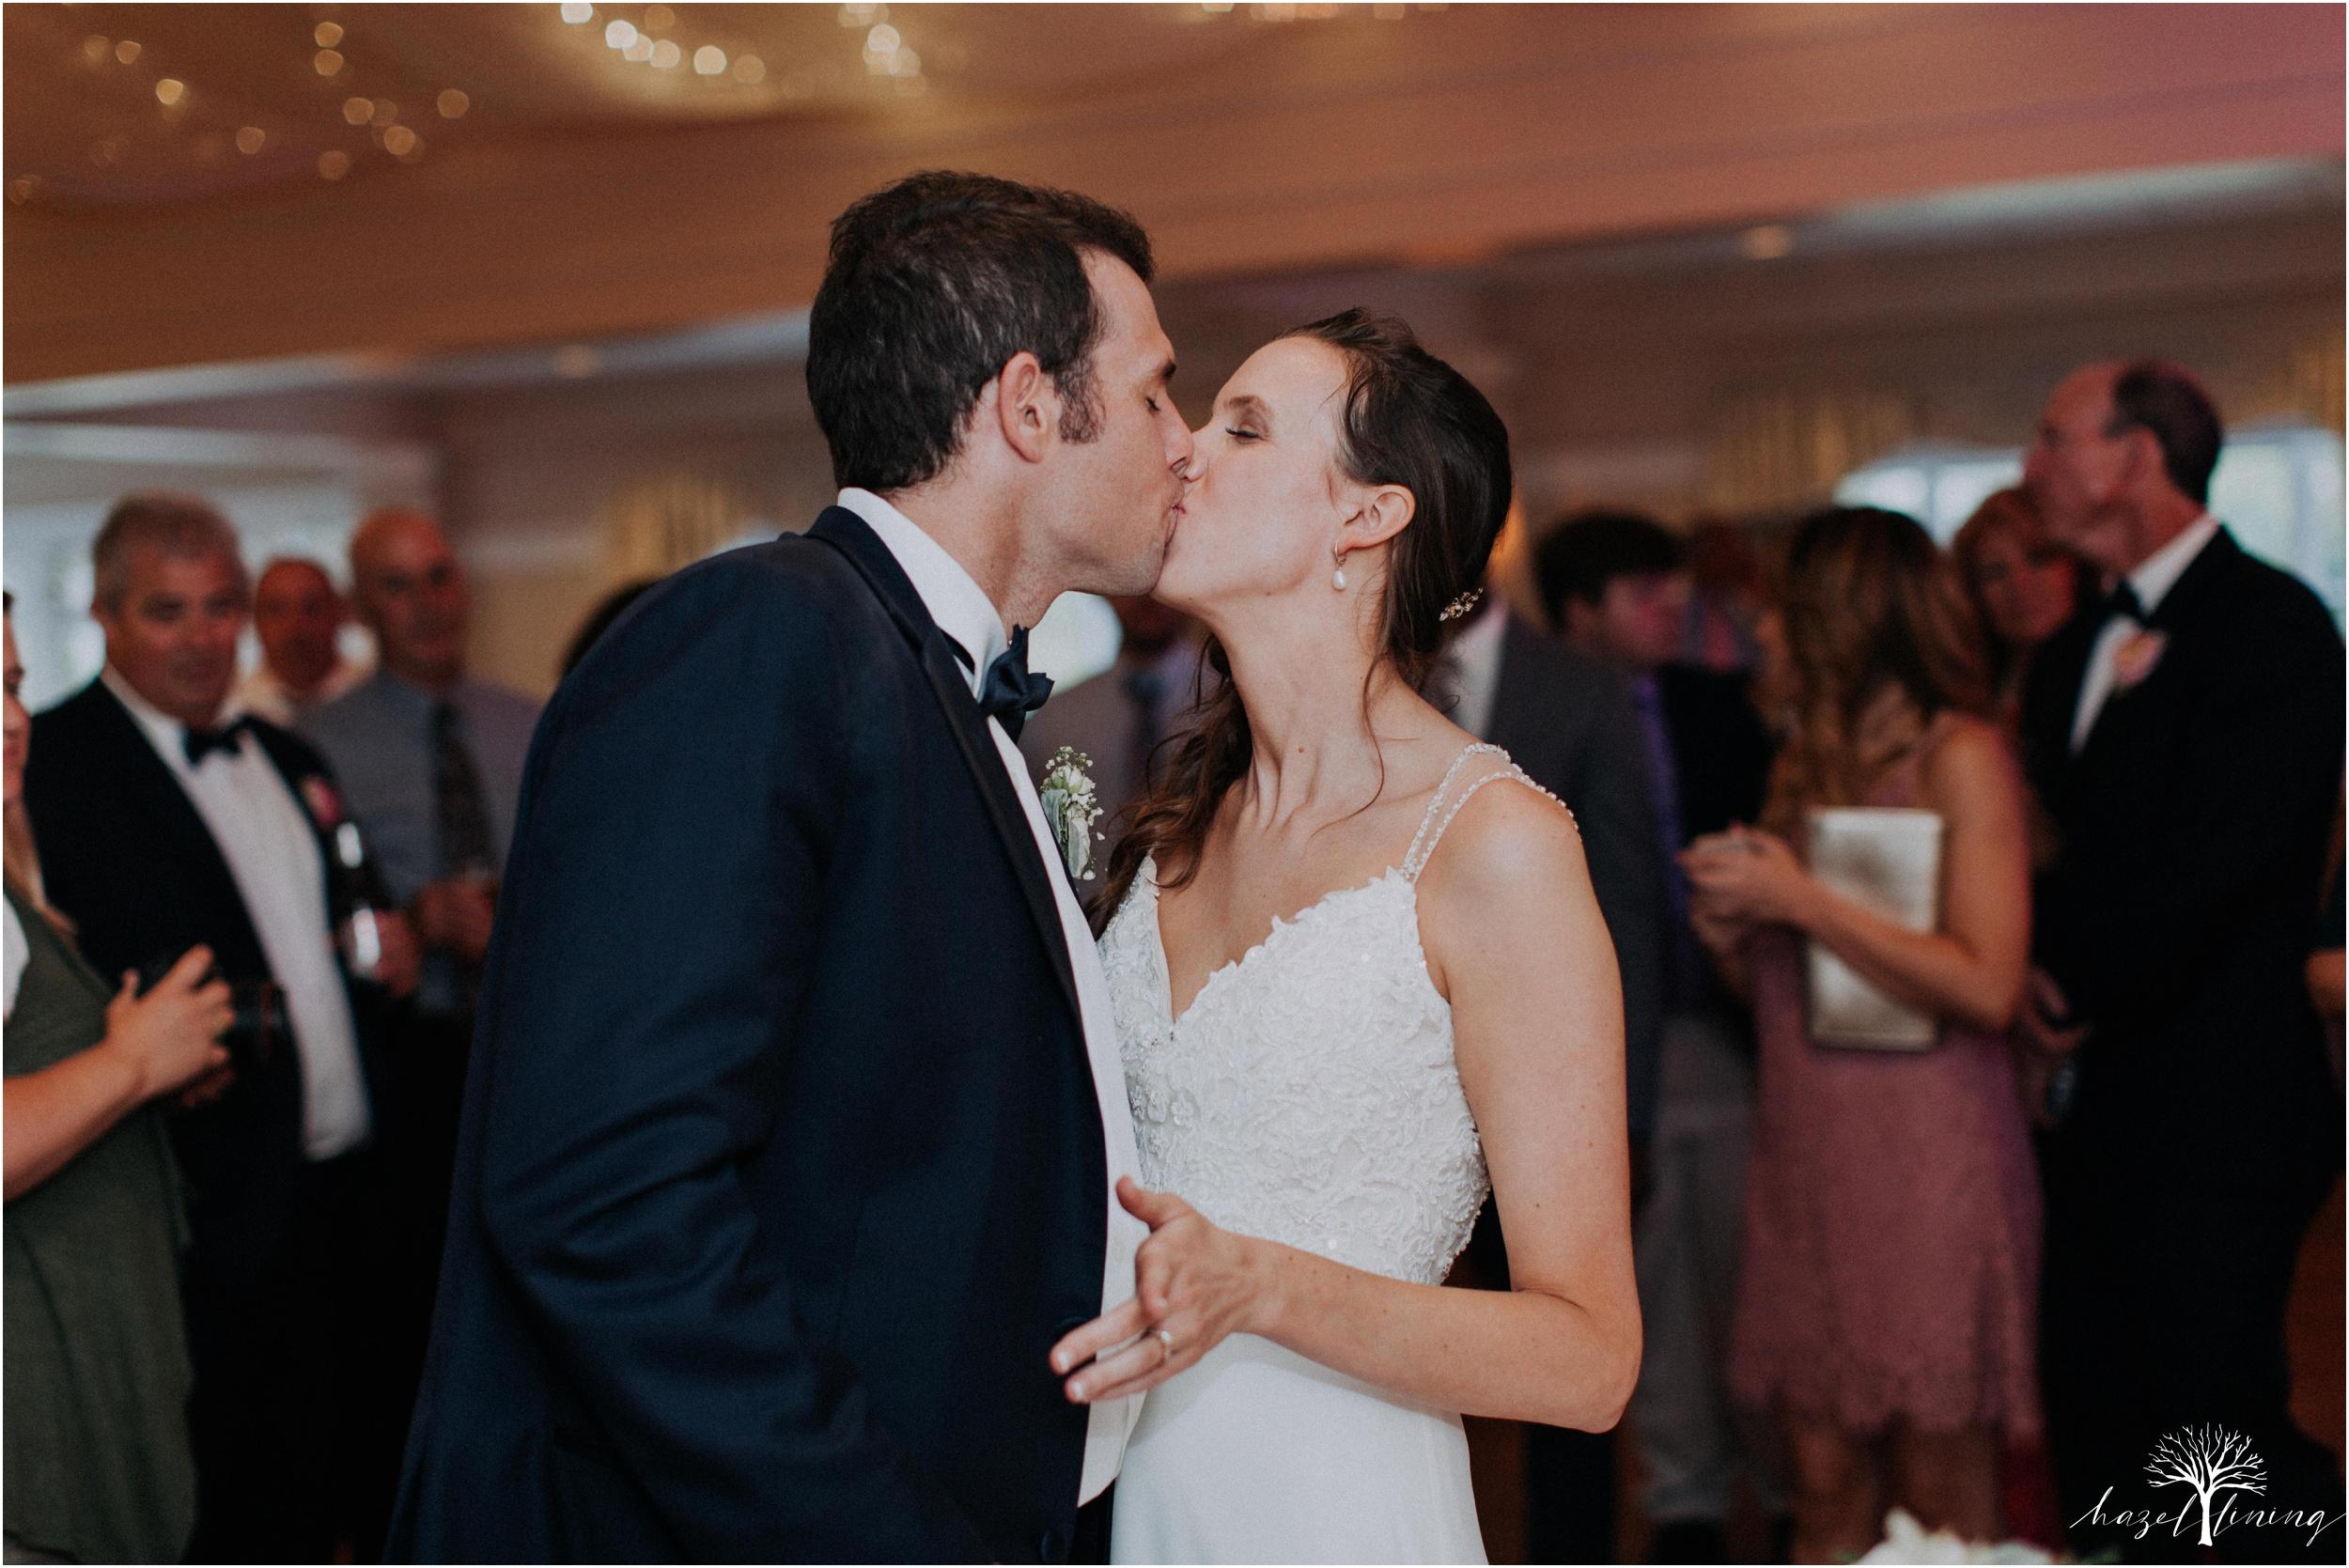 hazel-lining-travel-wedding-elopement-photography_0151.jpg